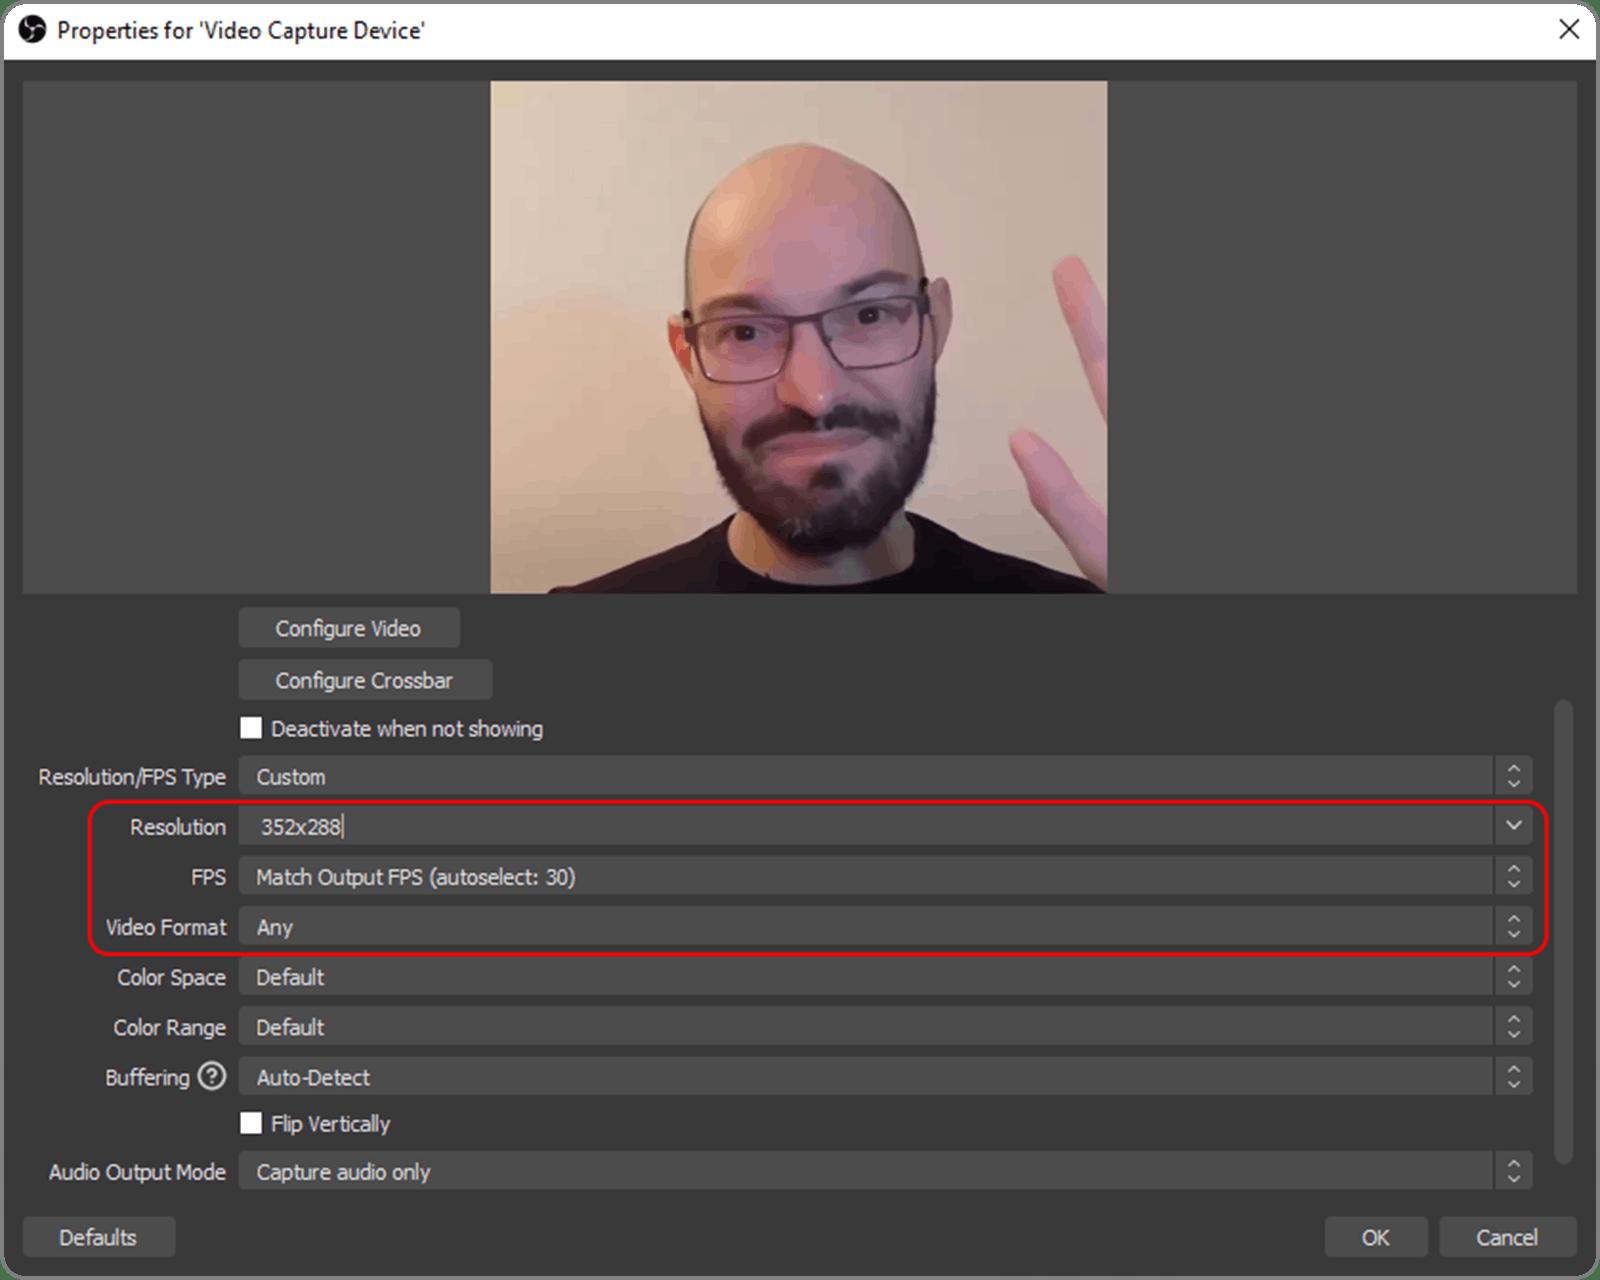 obs_03_camera_settings_custom_resolution_set.png